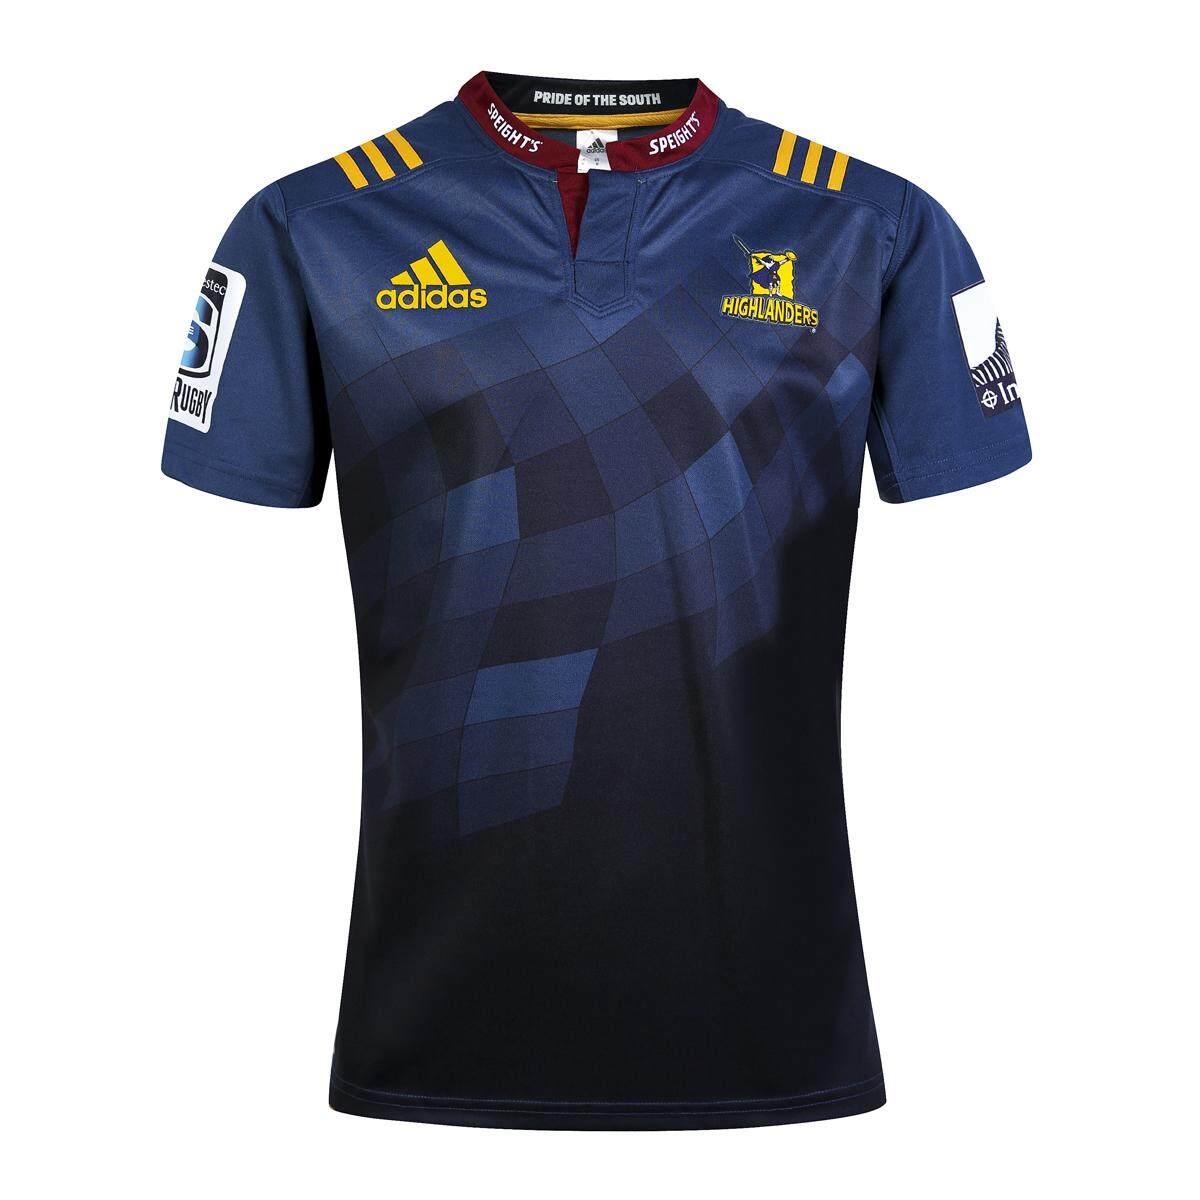 fec664261d0 Soccer Jerseys for sale - Mens Football Jerseys Online Deals ...